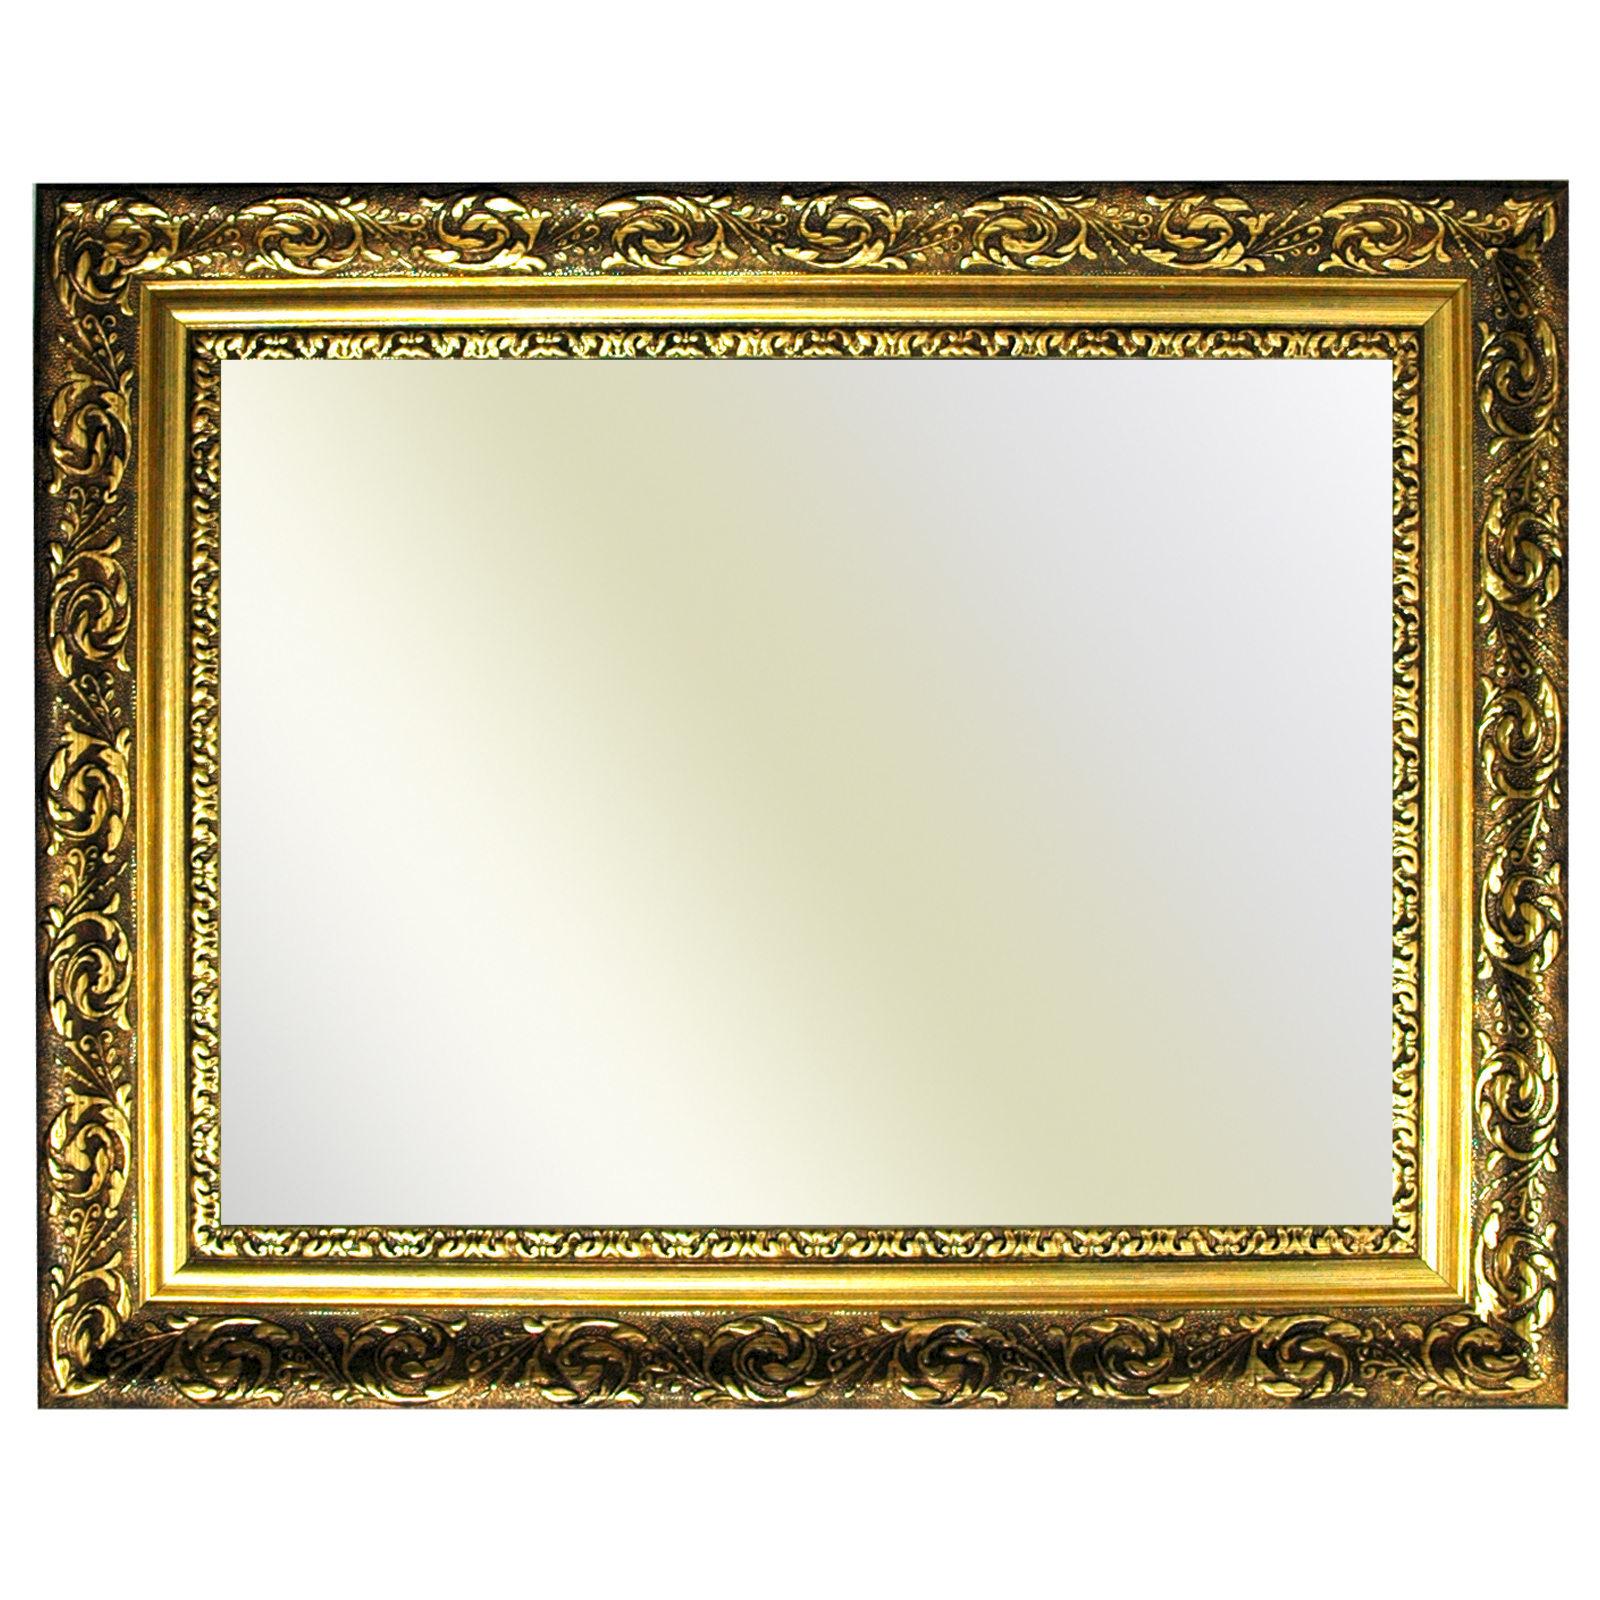 oro marco barroco finamente decorado 840 Oro, diferentes variantes ...